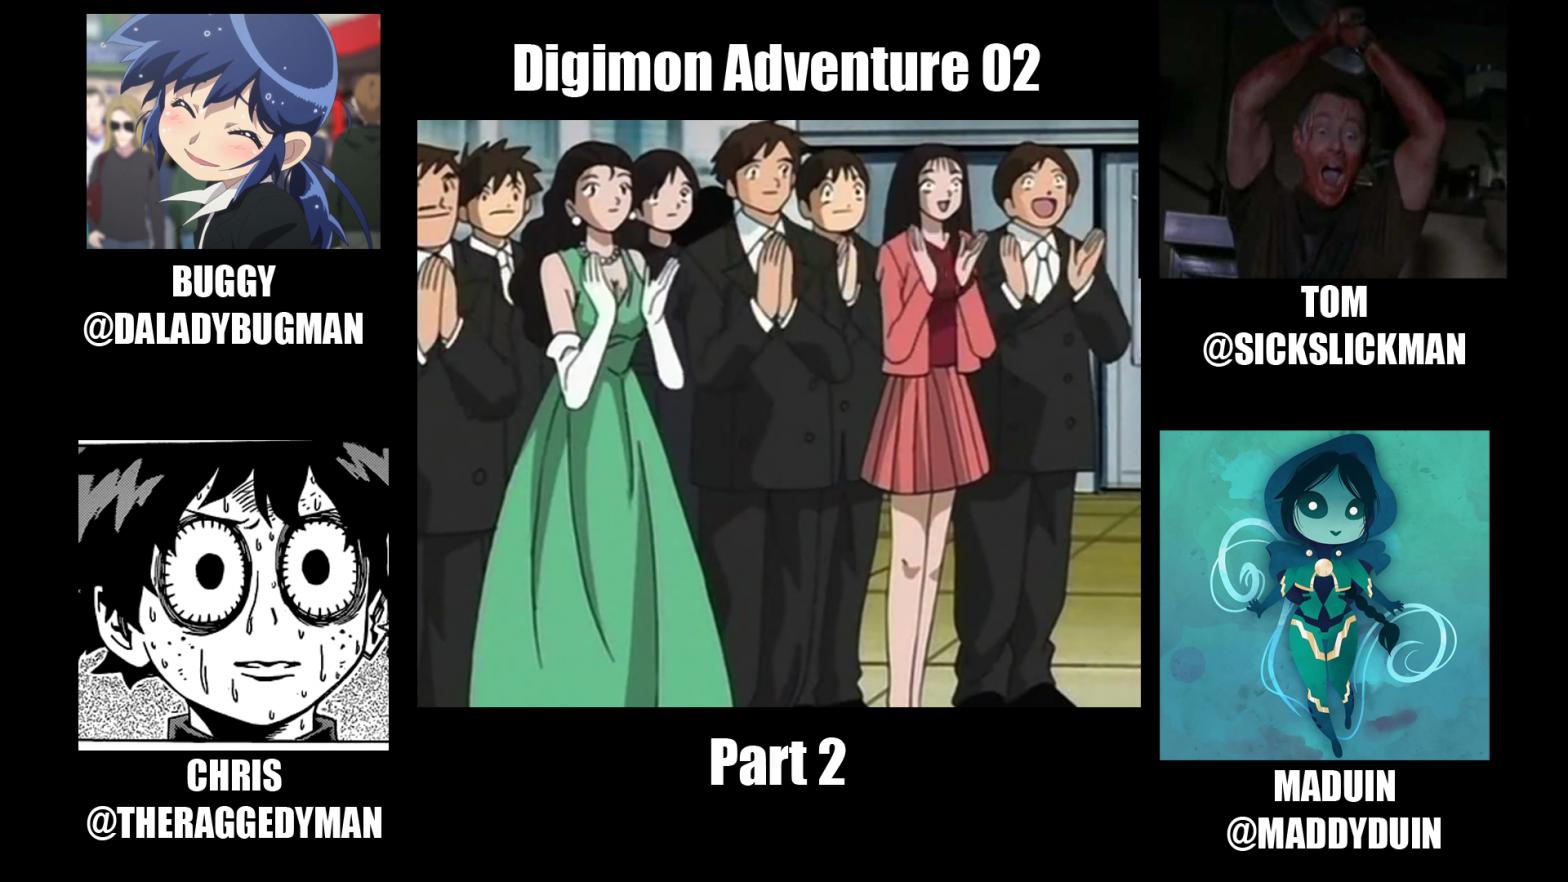 Digicast 4: Matt ODs in Space (Adventure 02 Part 2)